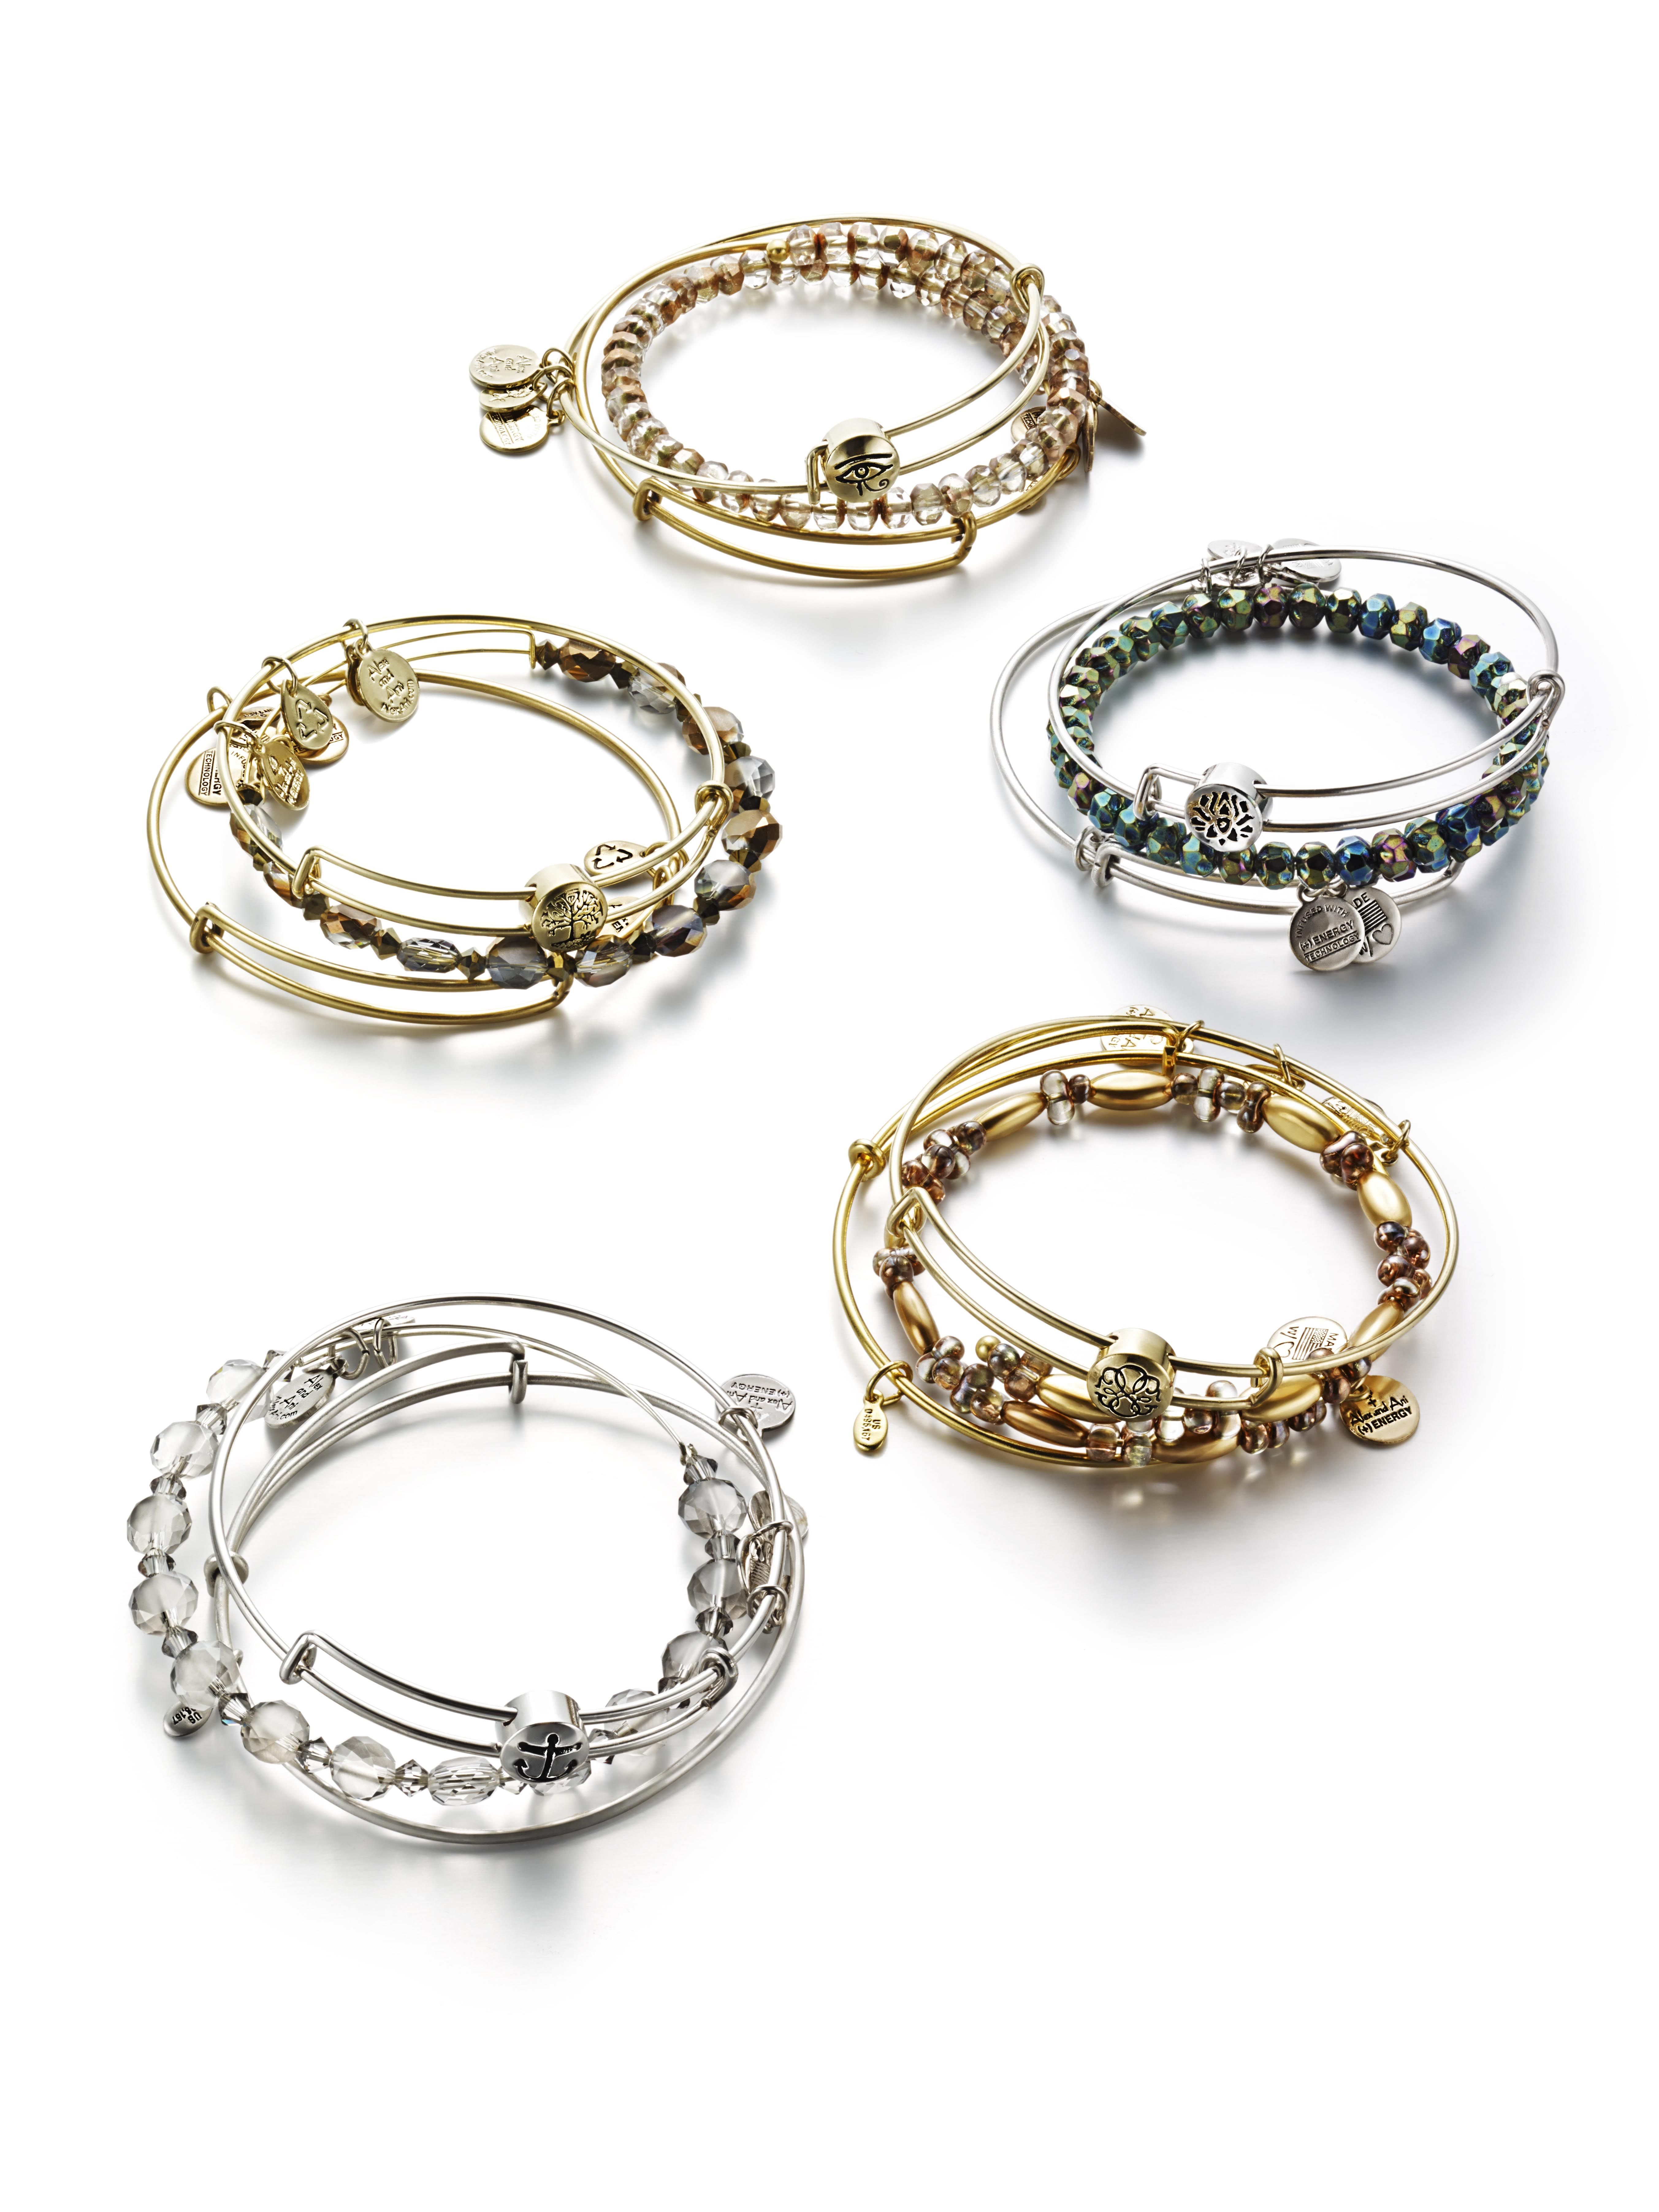 com cheap ireland nordstrom nice ani dillards near design bracelets ideas incredible and me alex disney infinity